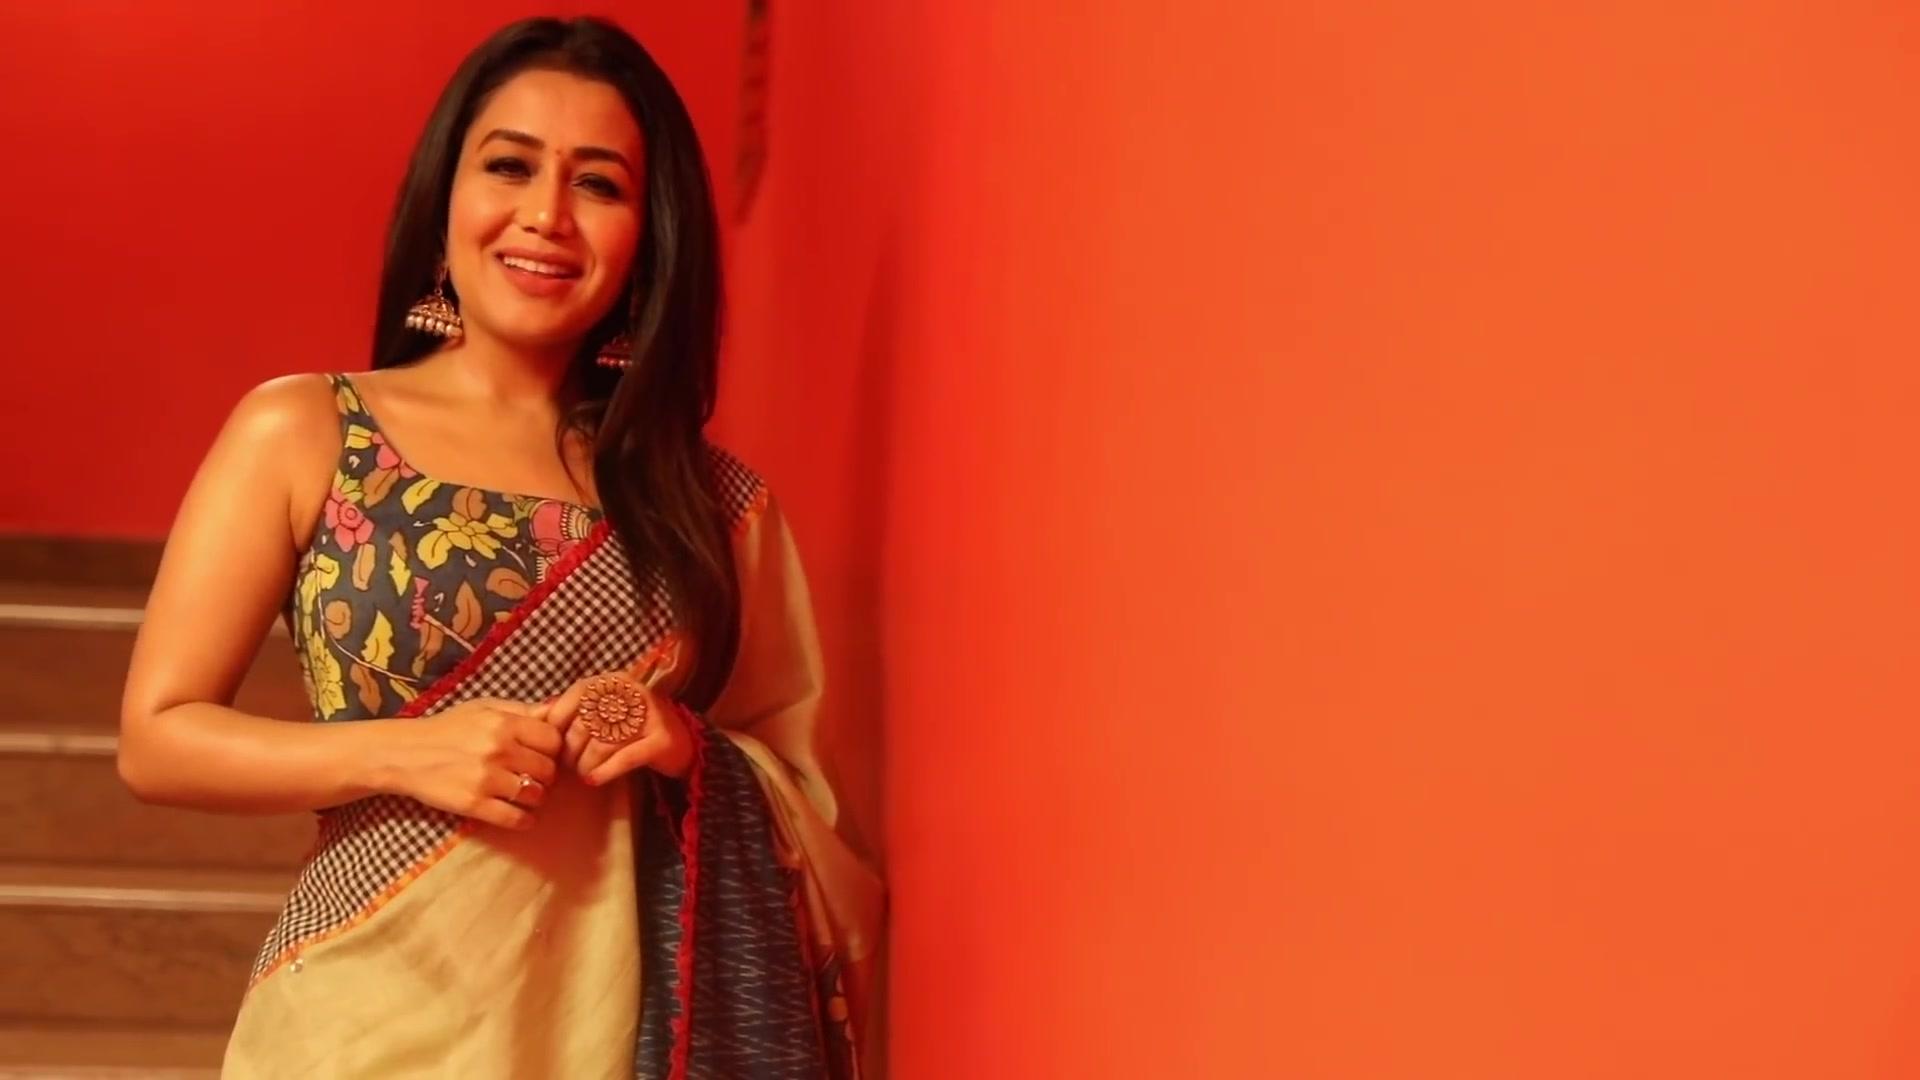 Neha Kakkar Celebrity Style In Tera Ghata Single 2019 From Tera Ghata Charmboard